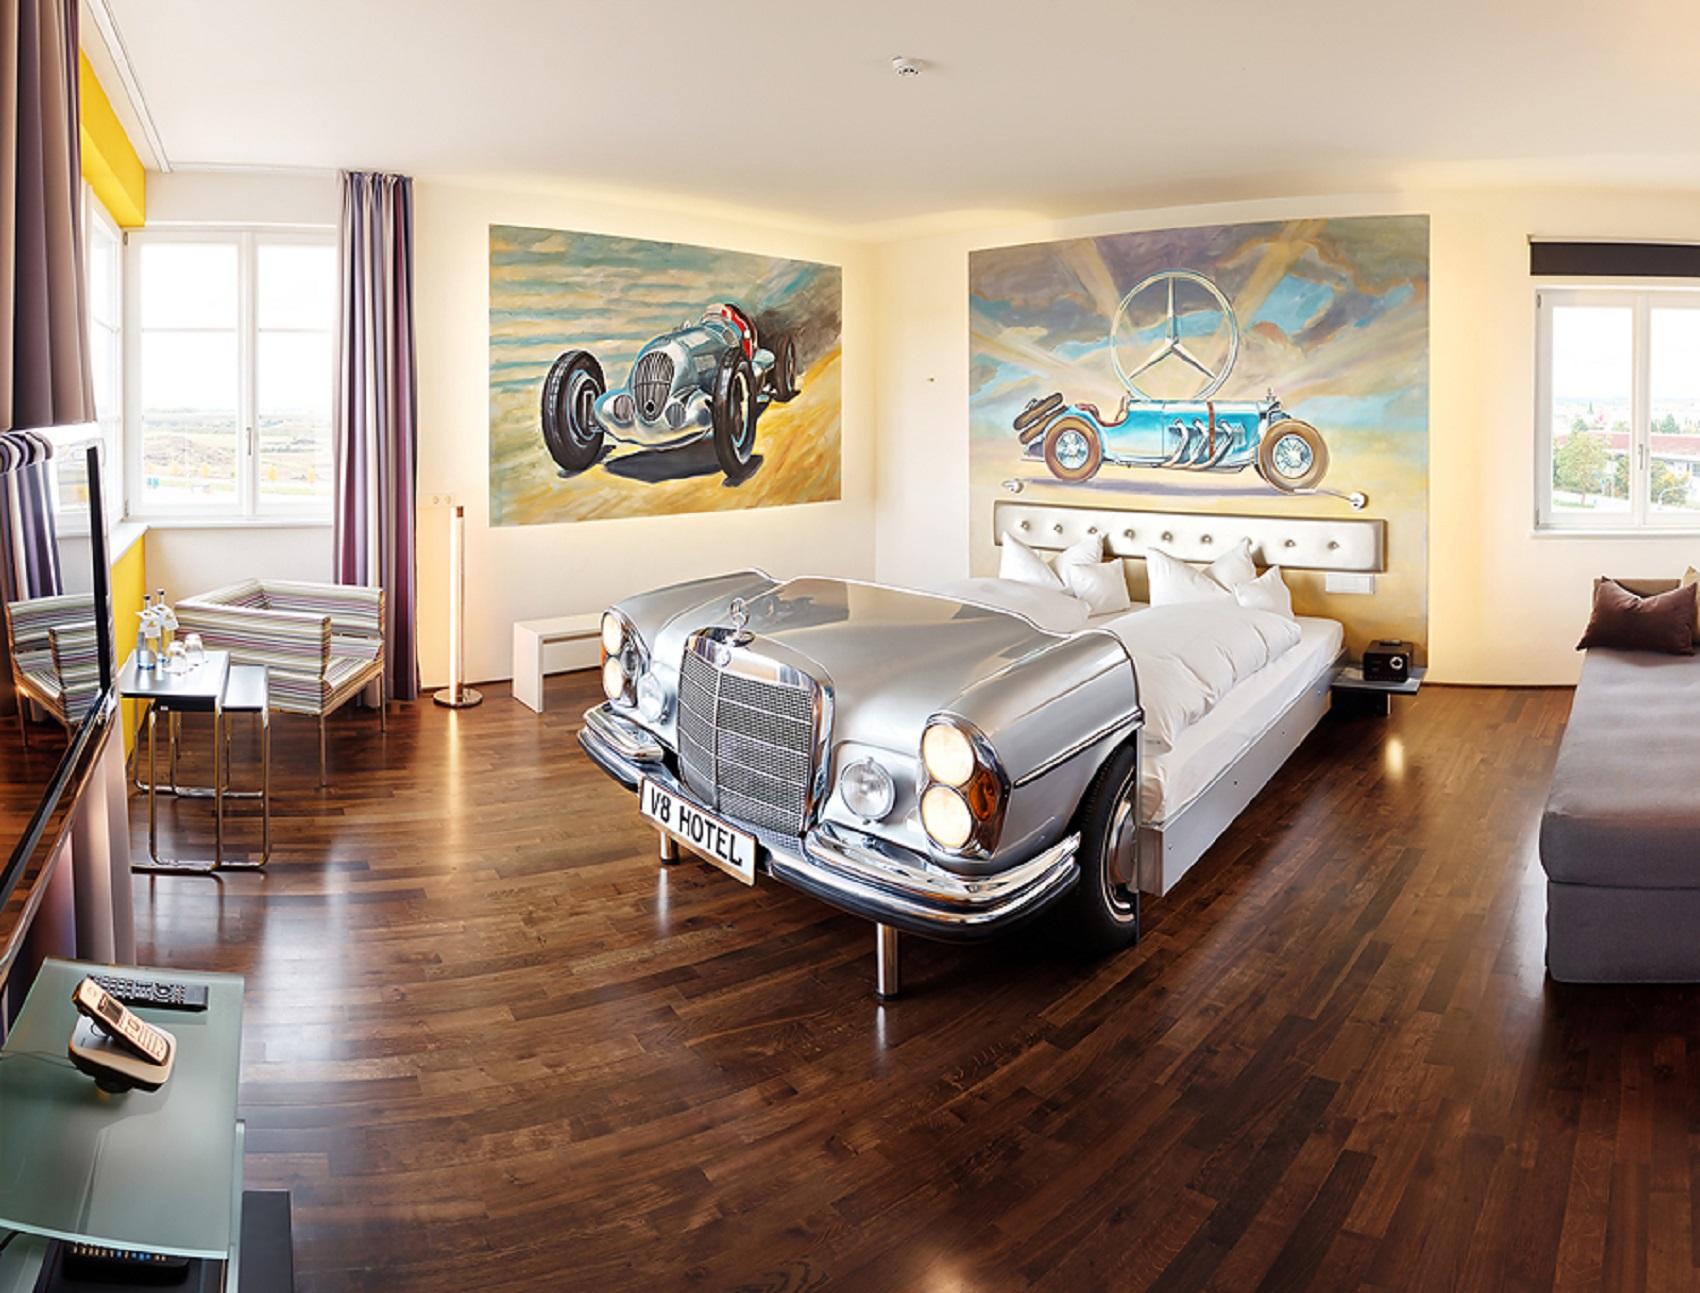 Hotel-V8-Stuttgart-Alemania